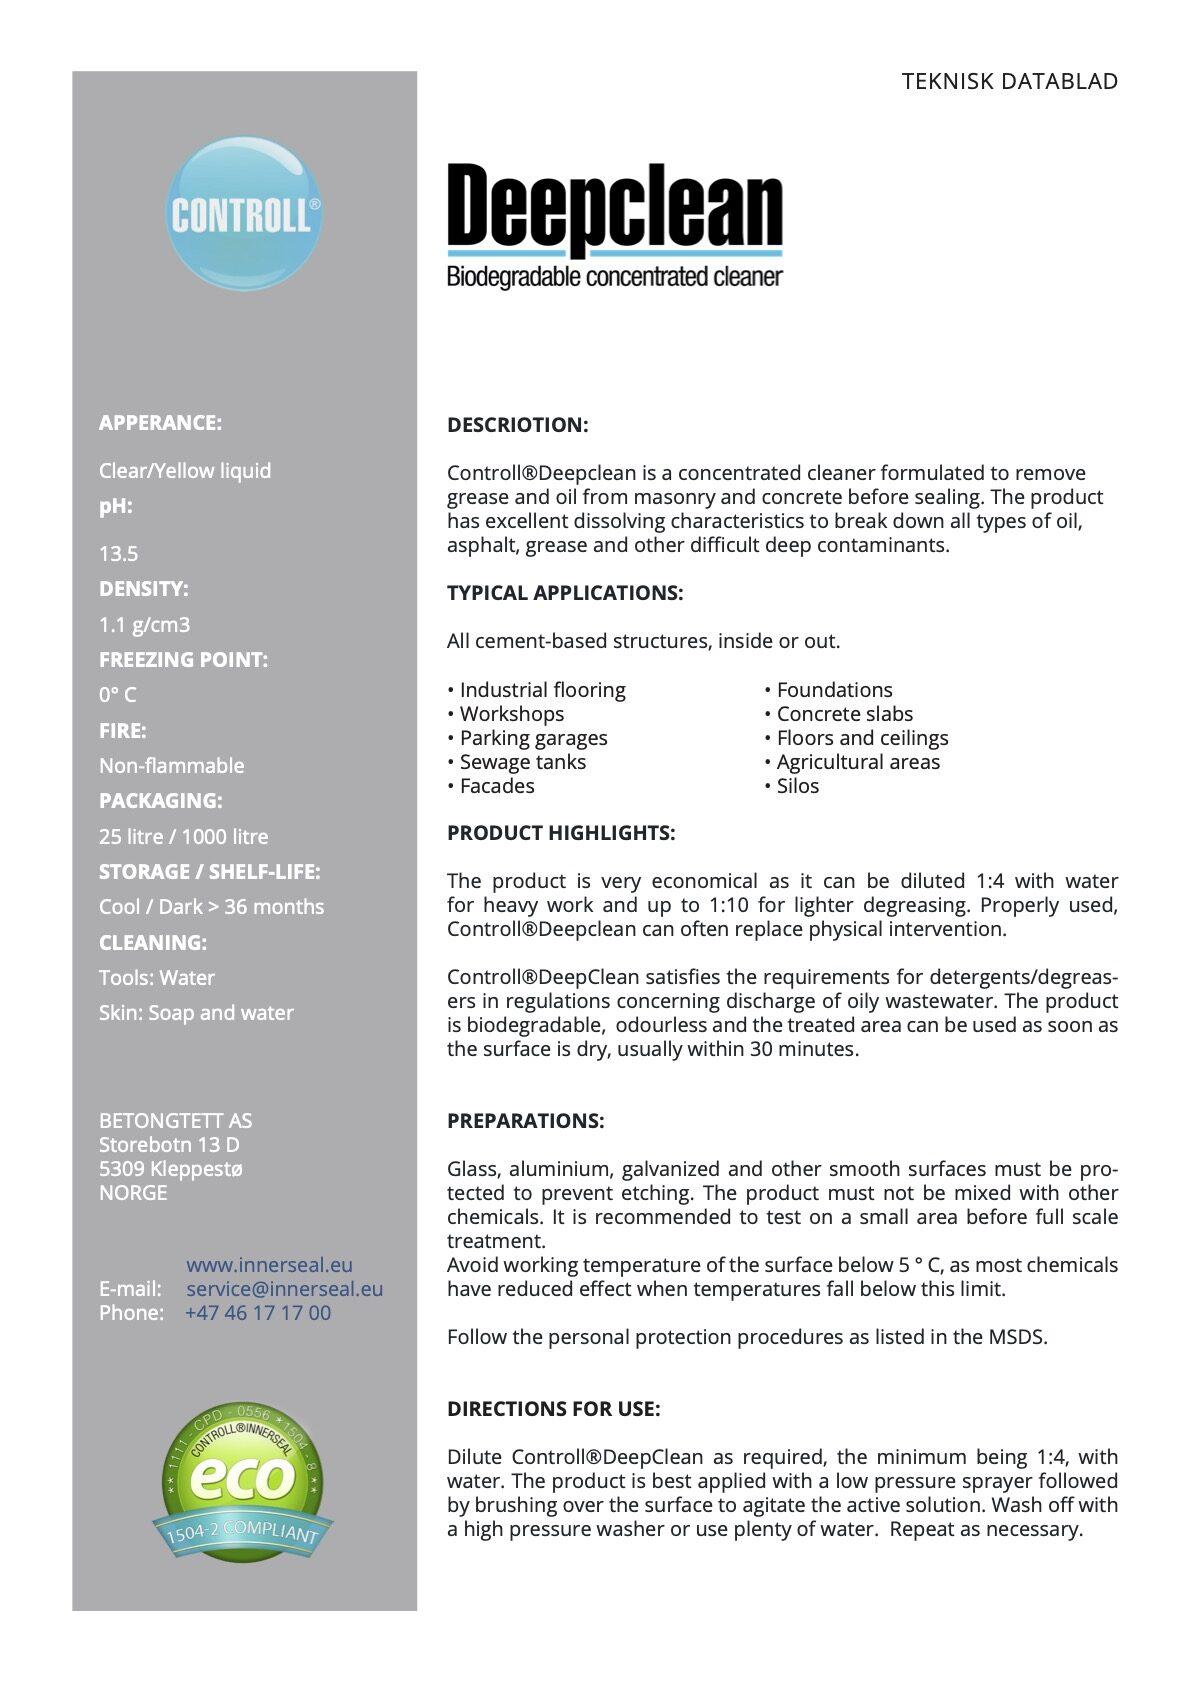 TDS Deepclean en Controll komsol Deutschland